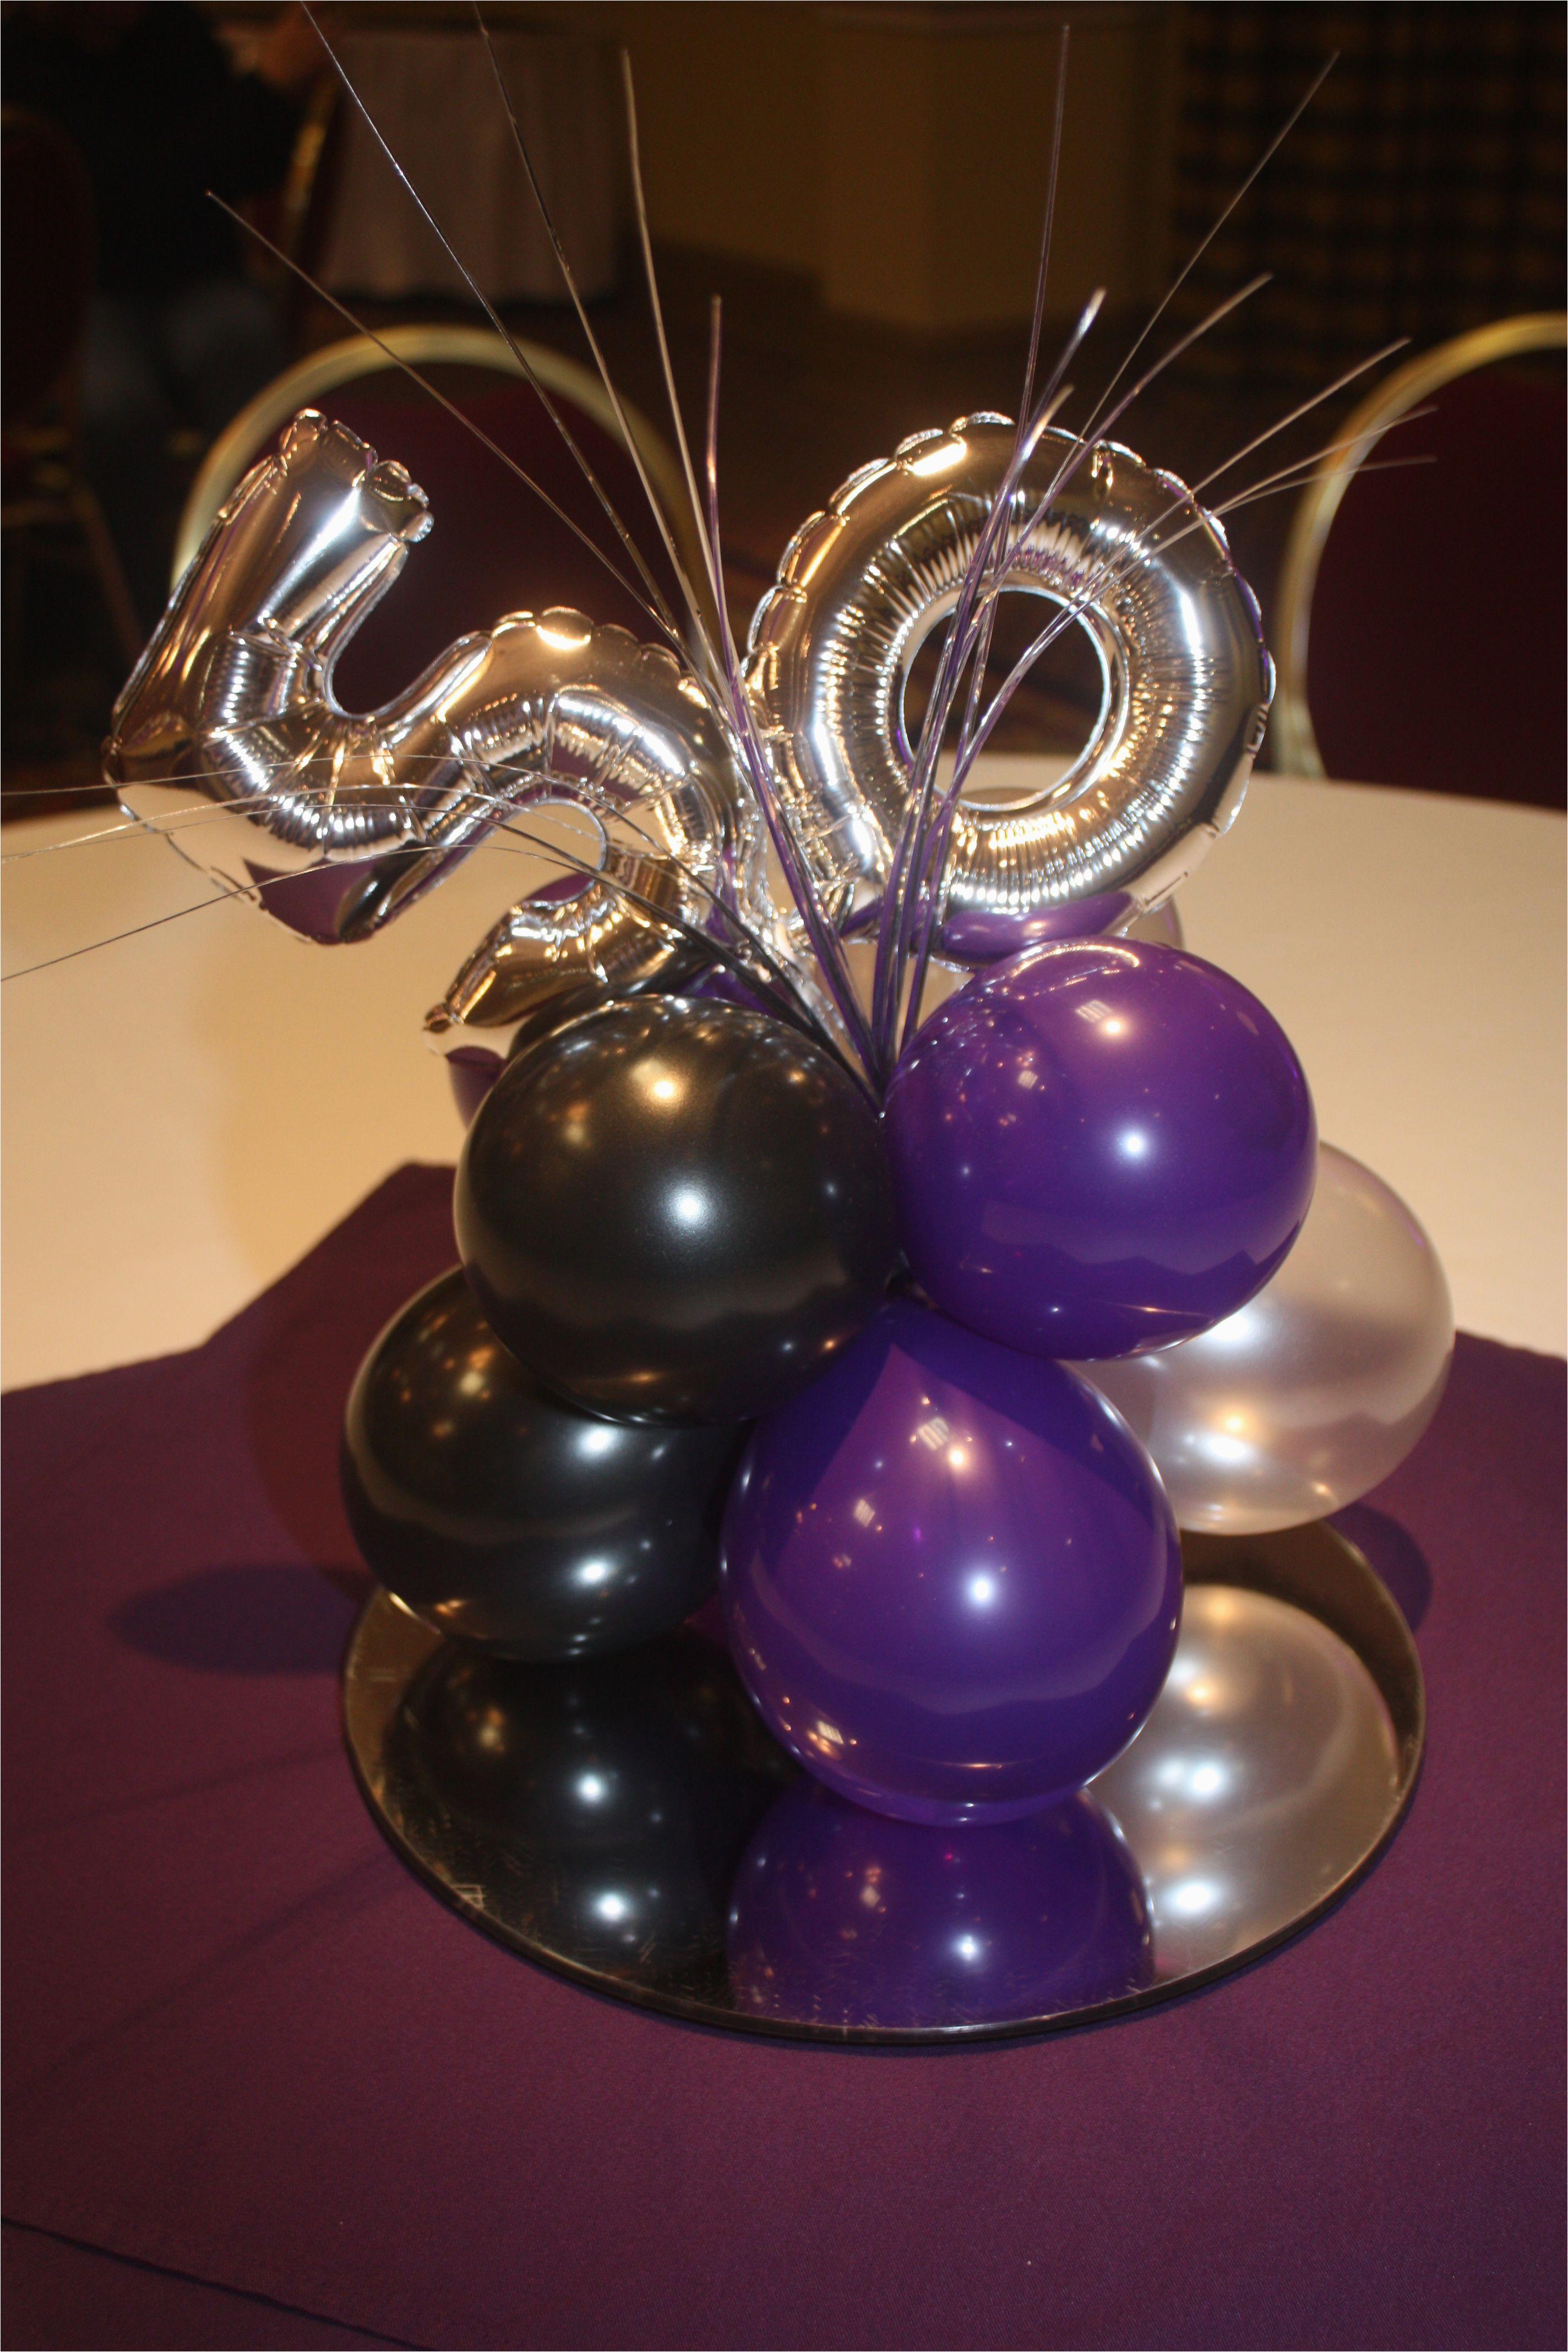 Balloon Decorations For 50th Birthday Centerpiece Ballooncenterpiece